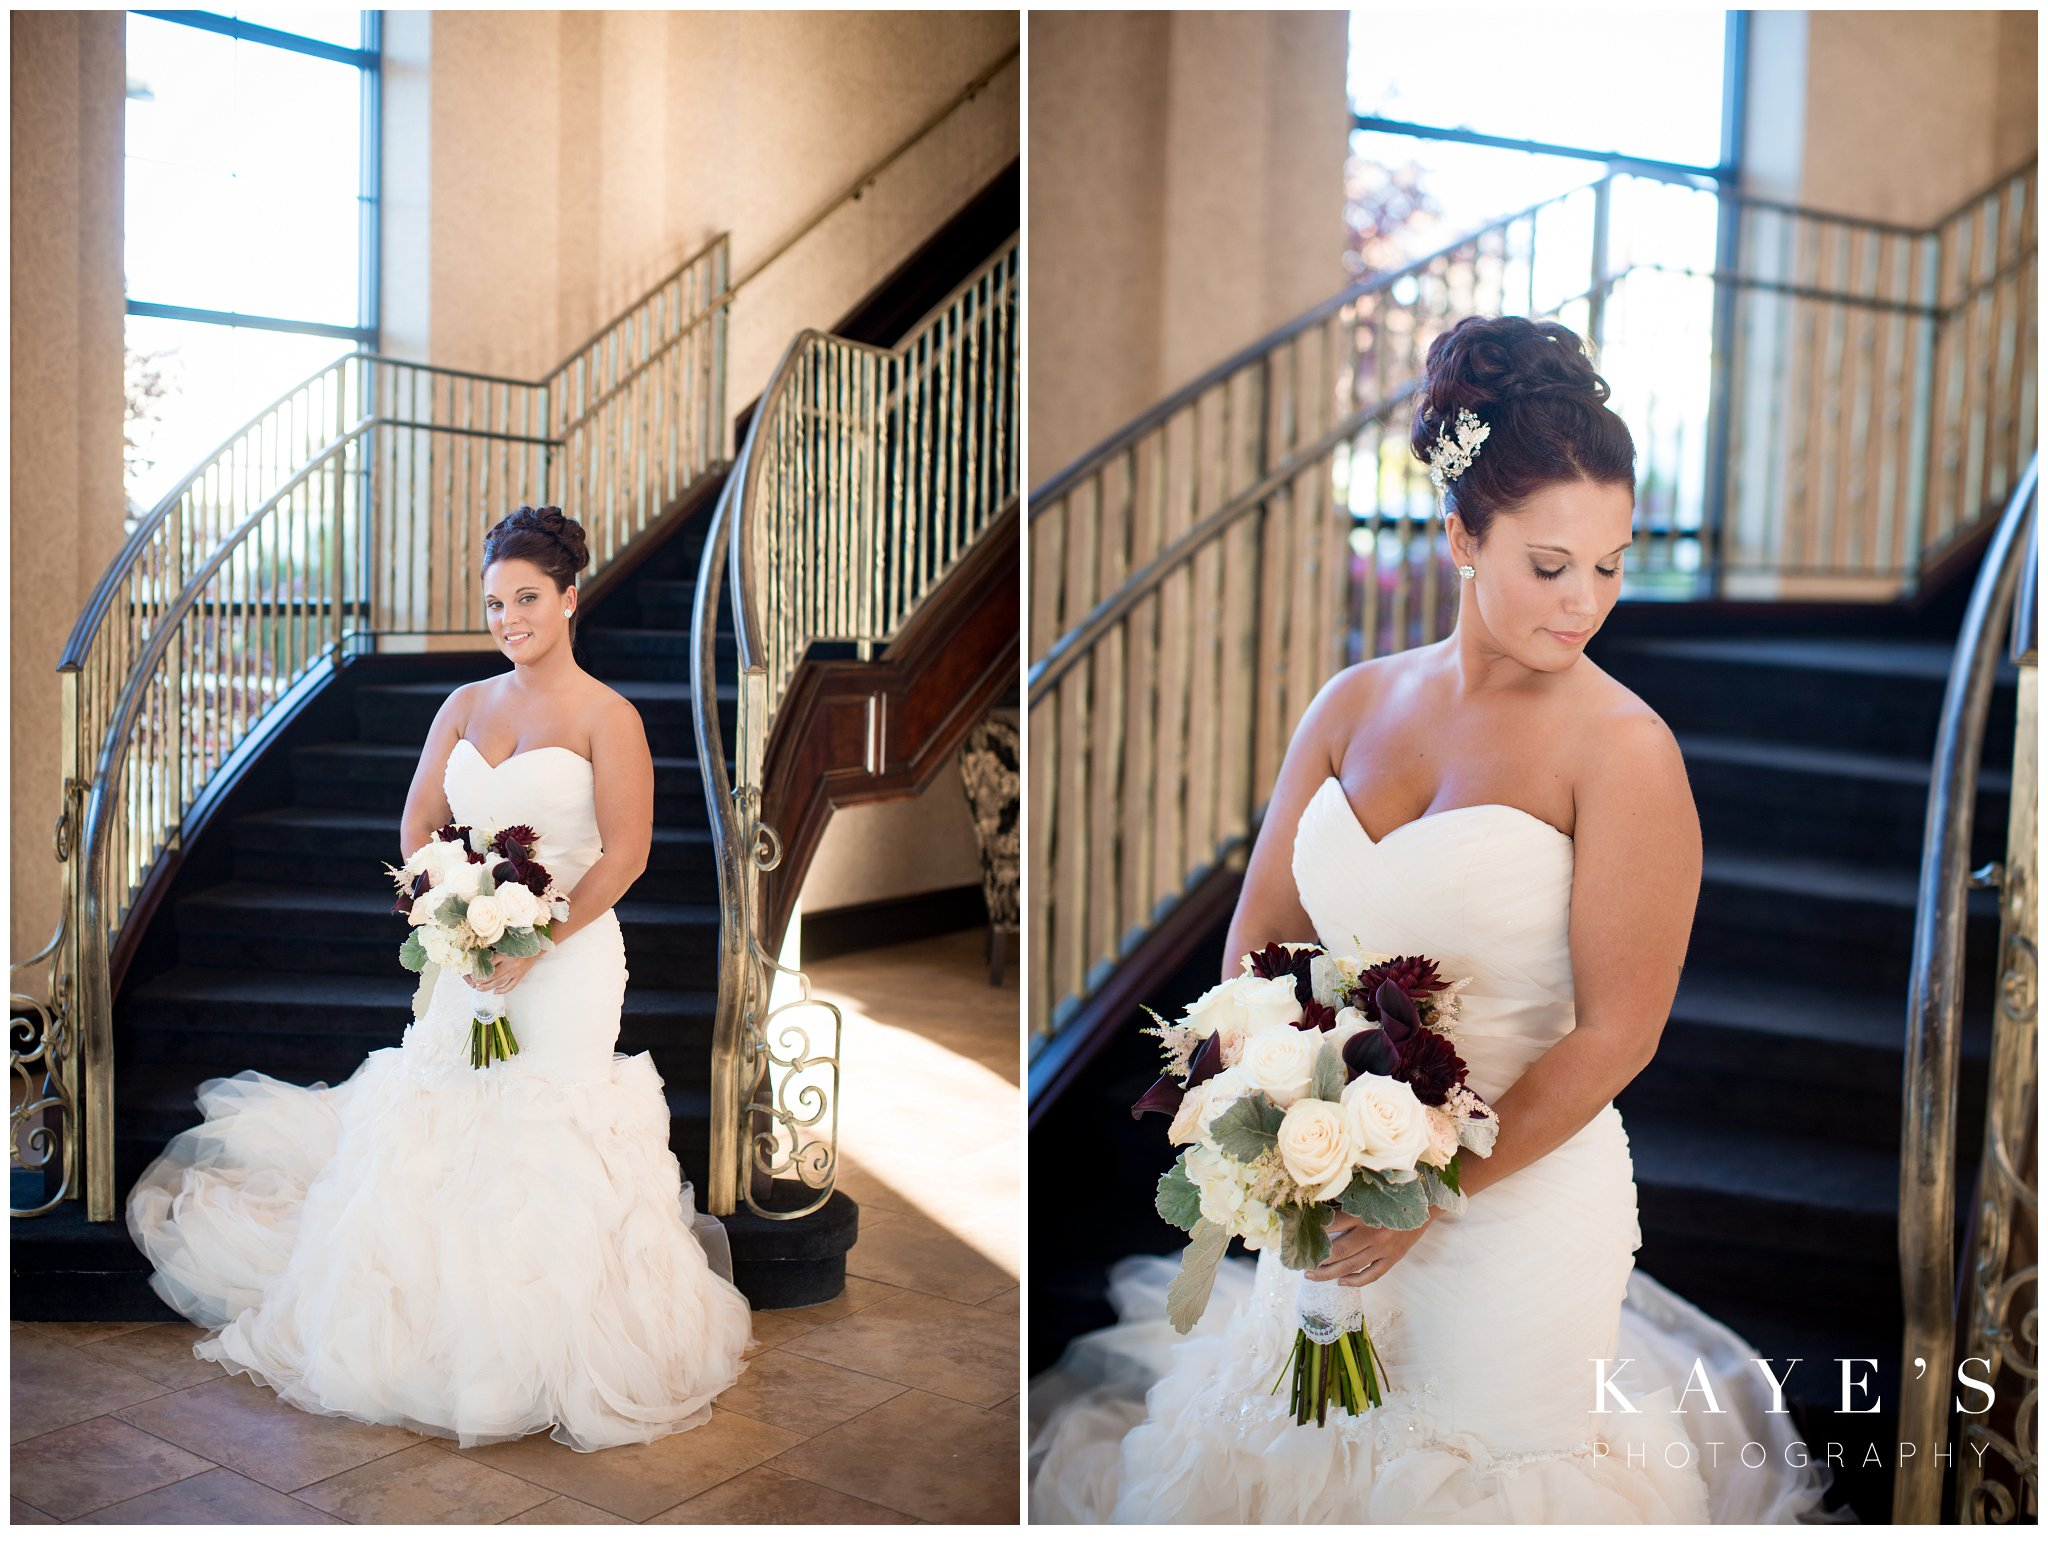 Kayes Photography- howell-michigan-wedding-photographer_0646.jpg